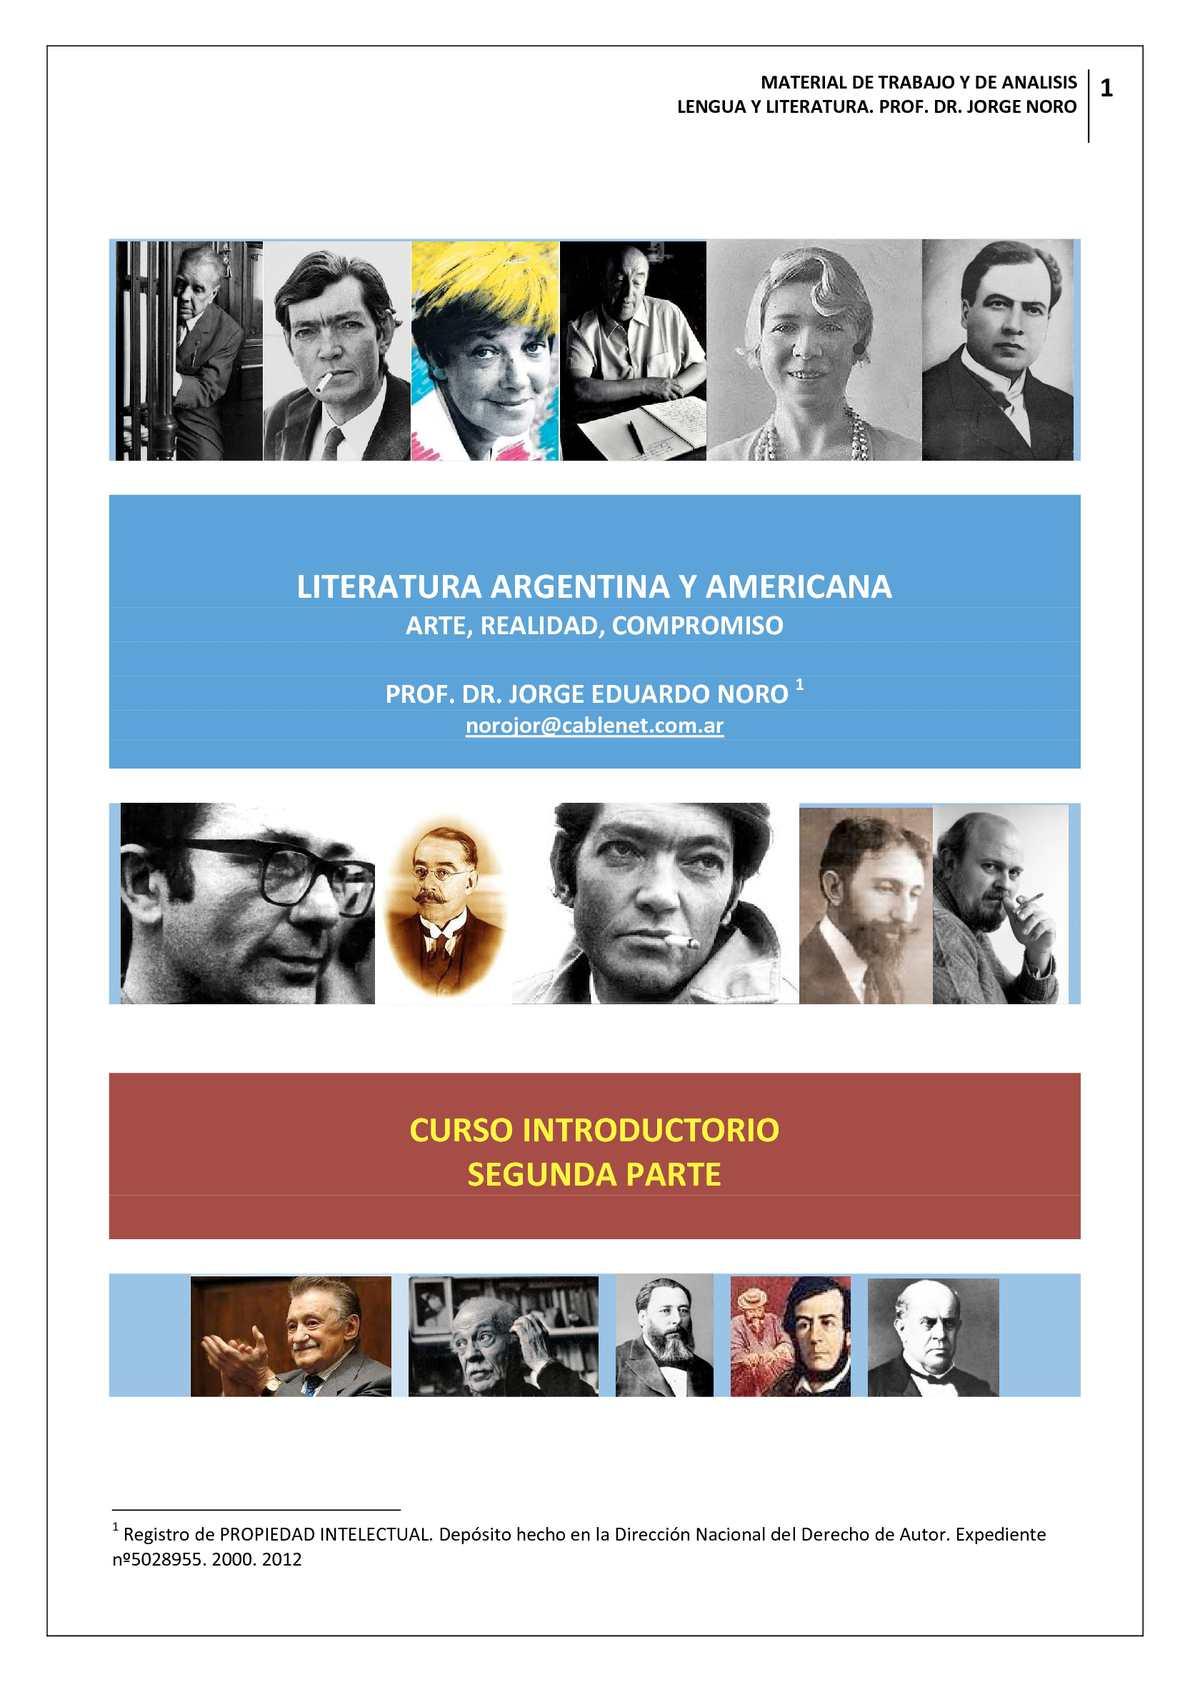 Calaméo - 102. CURSO DE LITERATURA ARGENTINA Y AMERICANA  SEGUNDA PARTE 18a1e27523a